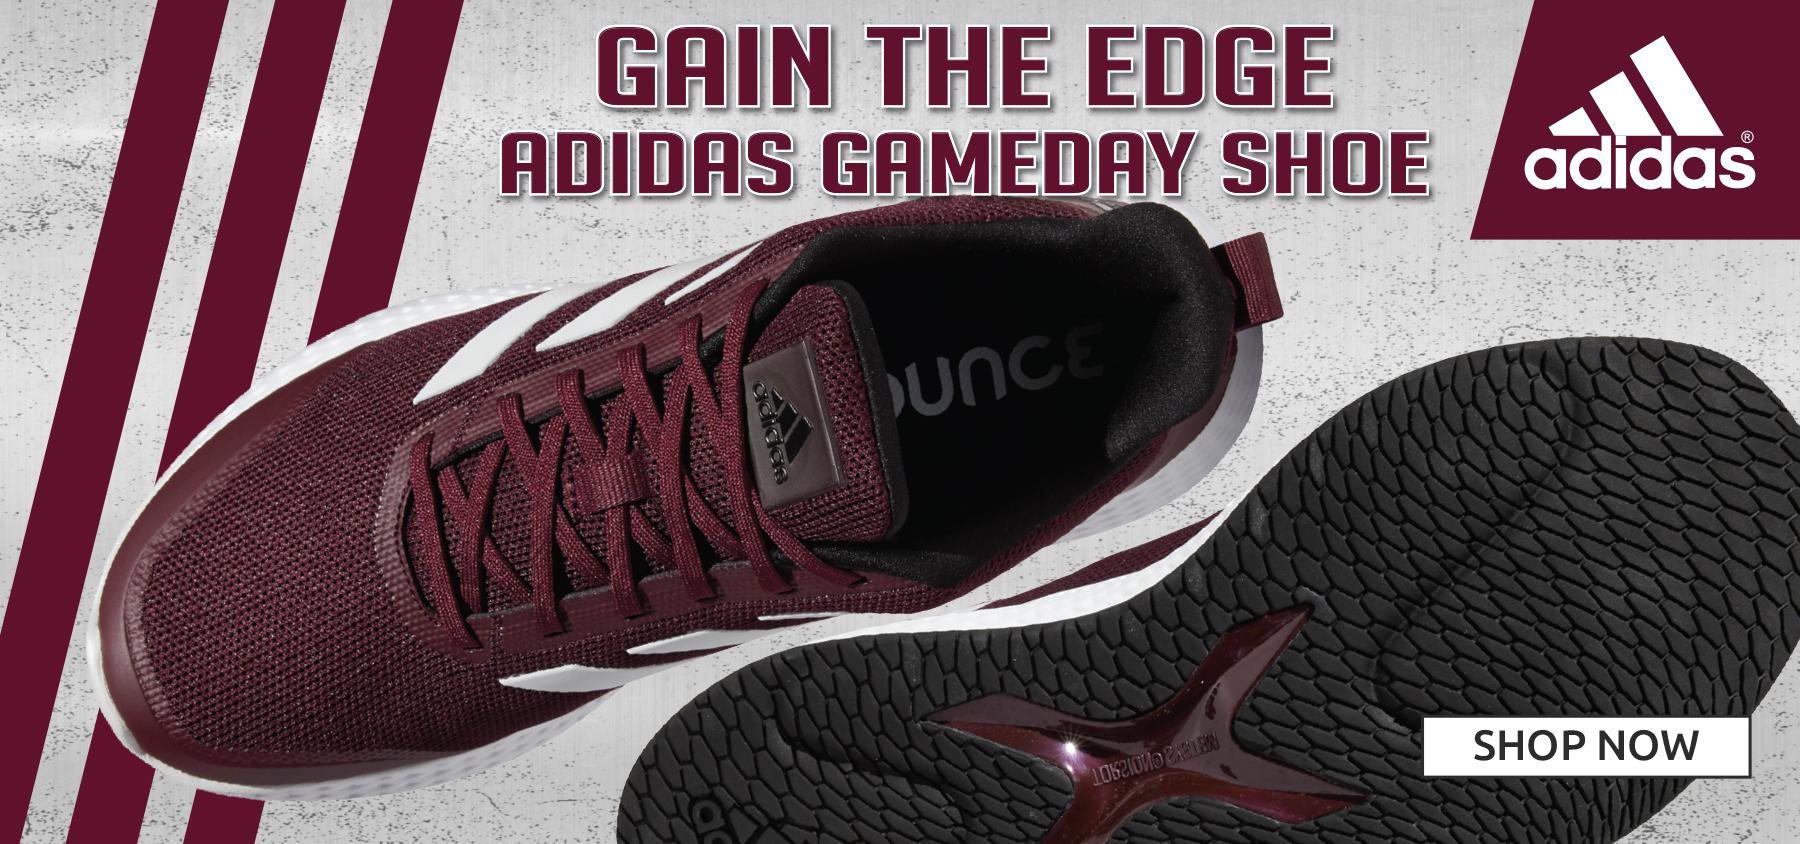 Maroon Adidas shoes